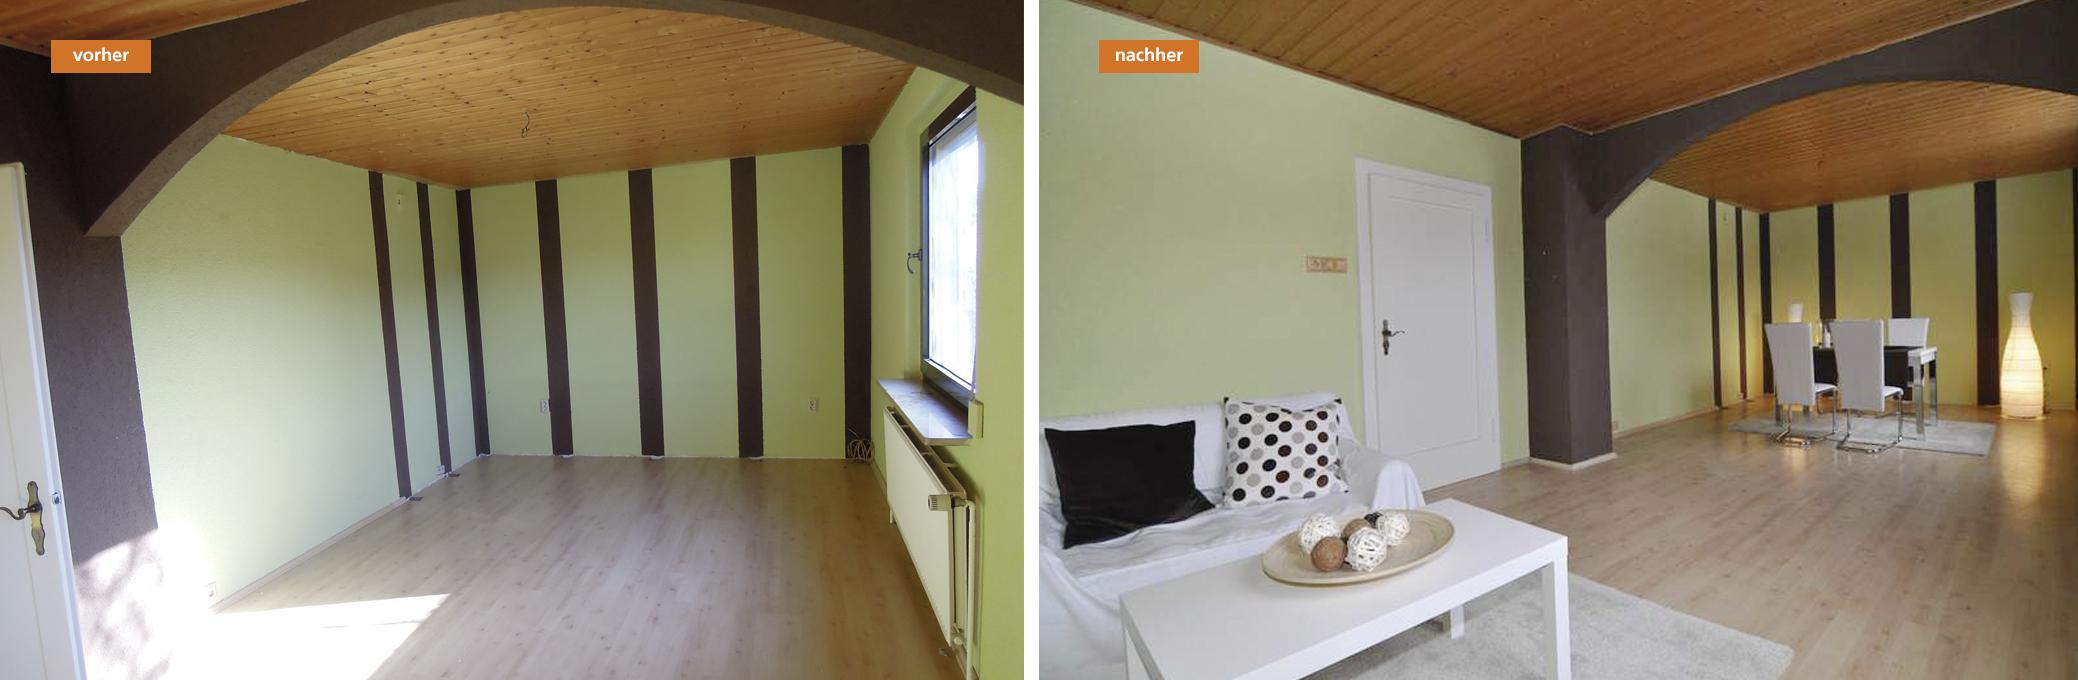 Home Staging   VR-Bank Immobilien Coburg